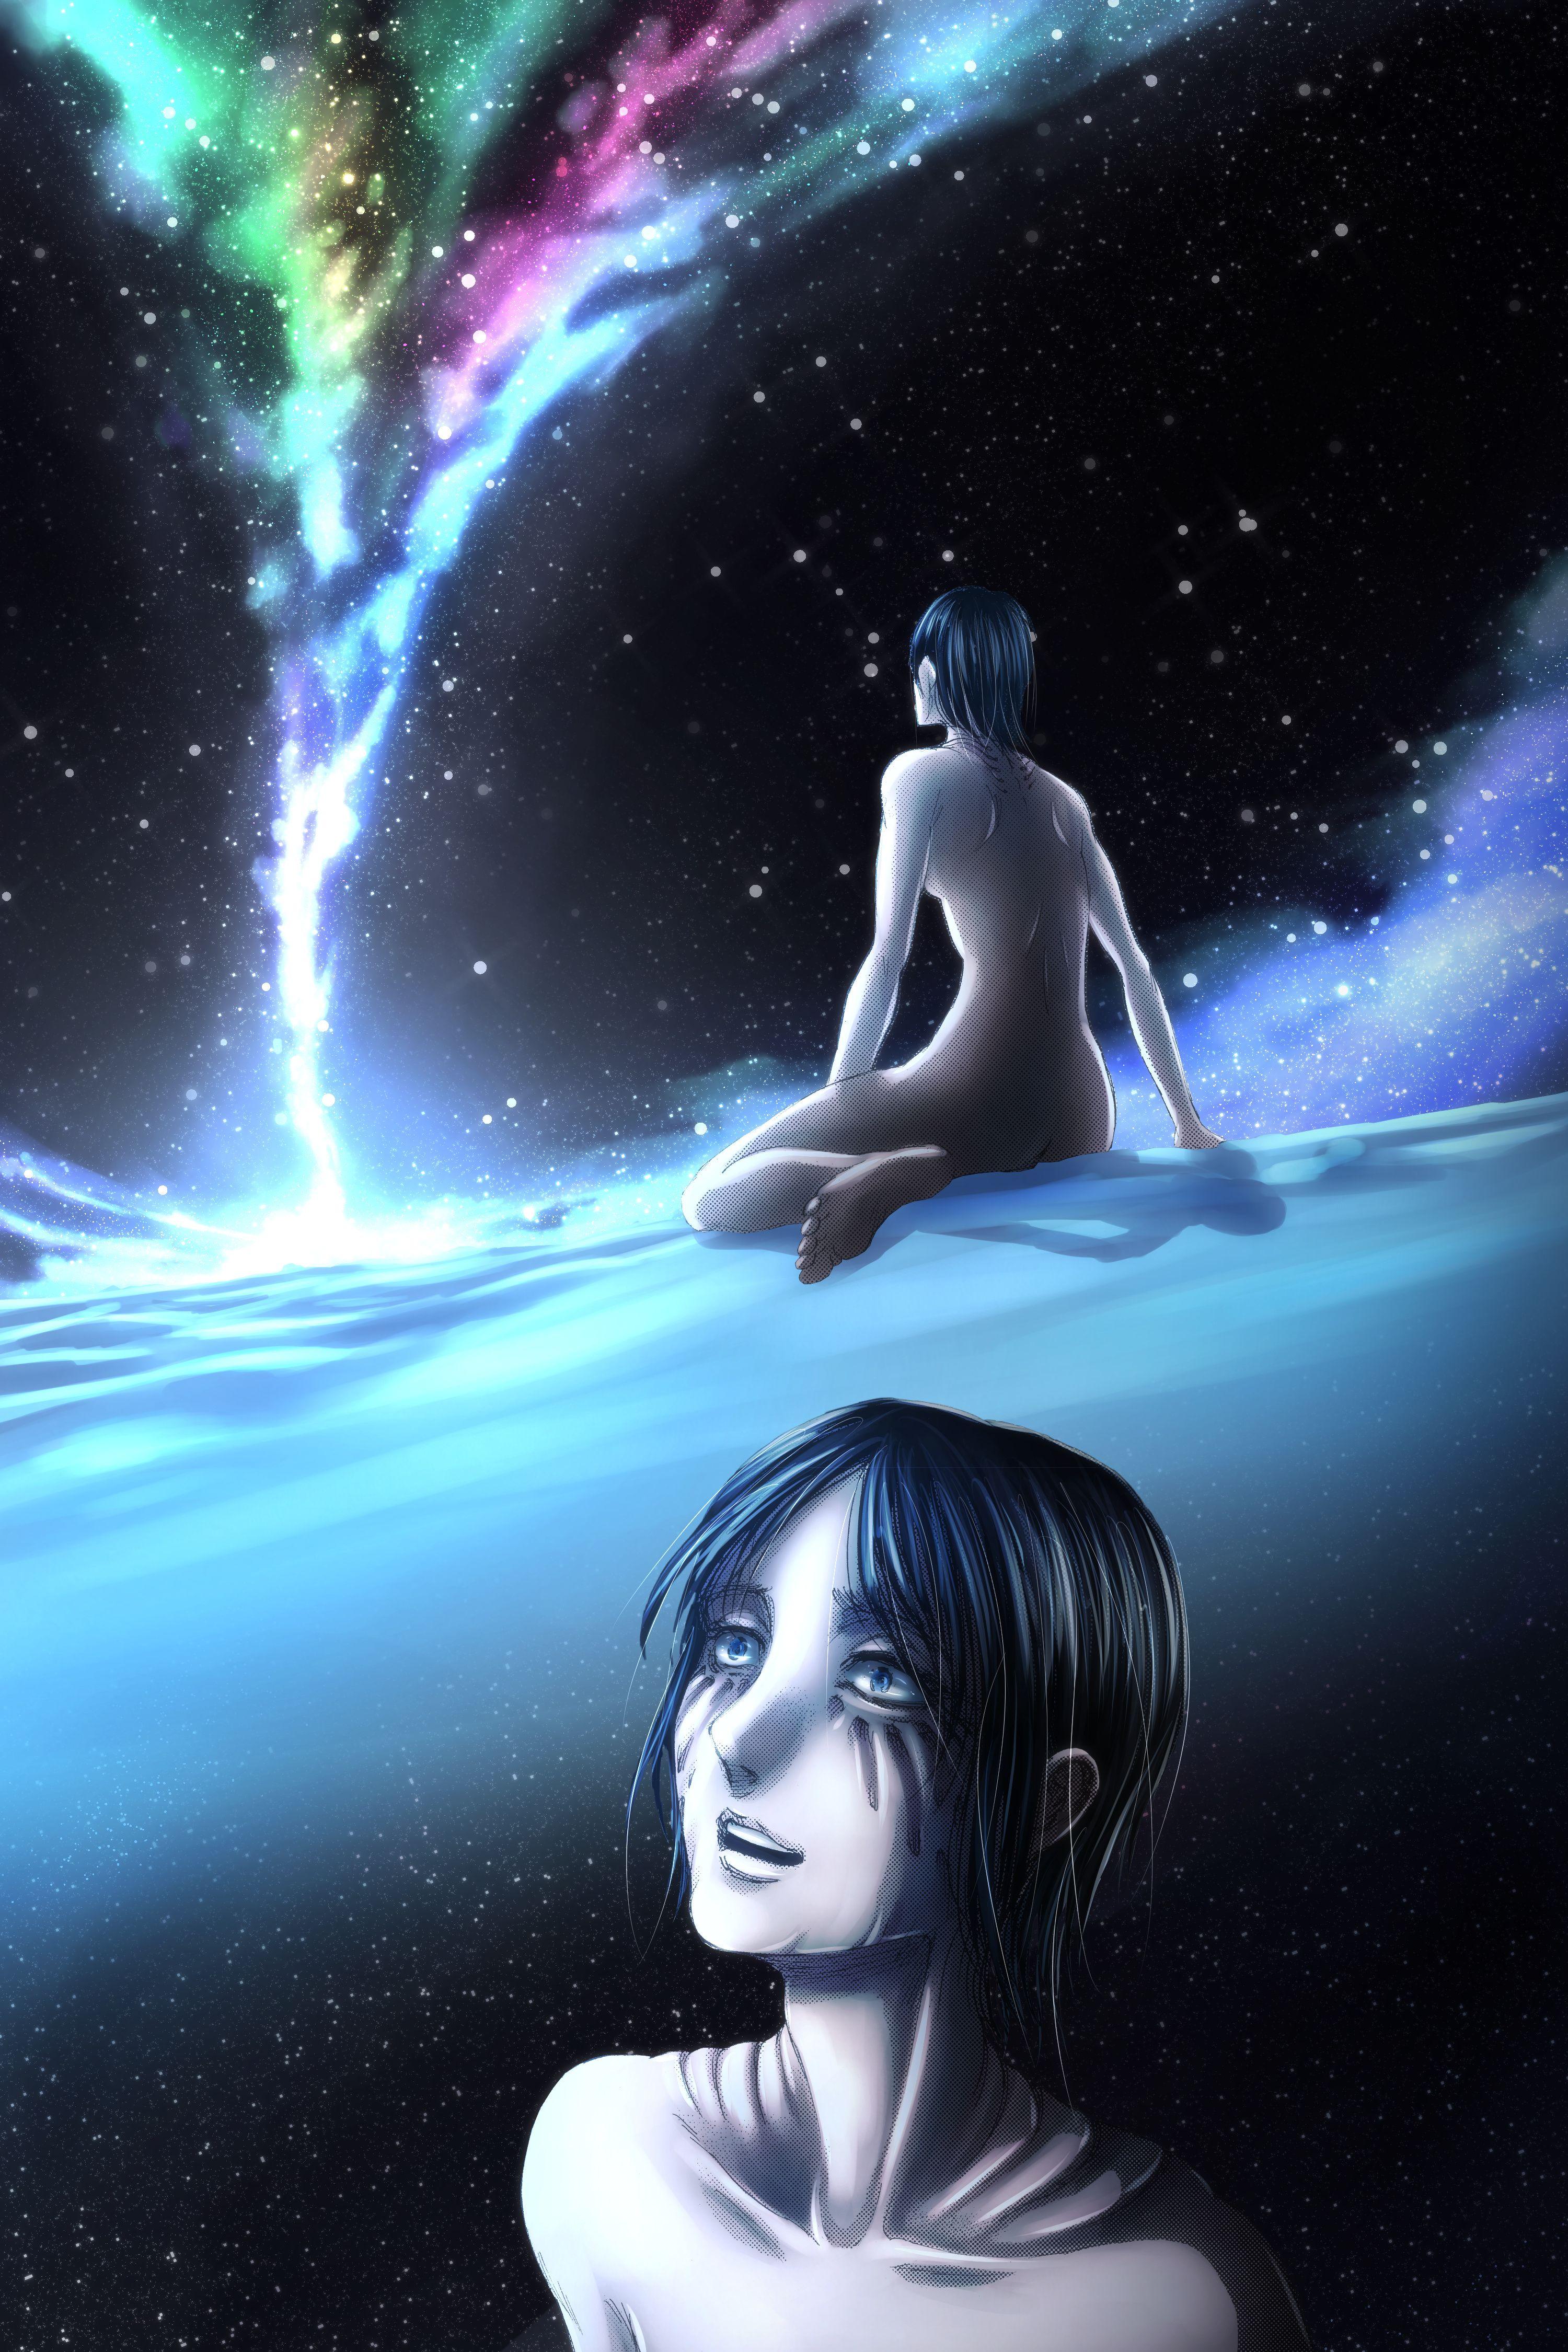 Attack on Titan (Shingeki No Kyojin) | Attack on titan ...